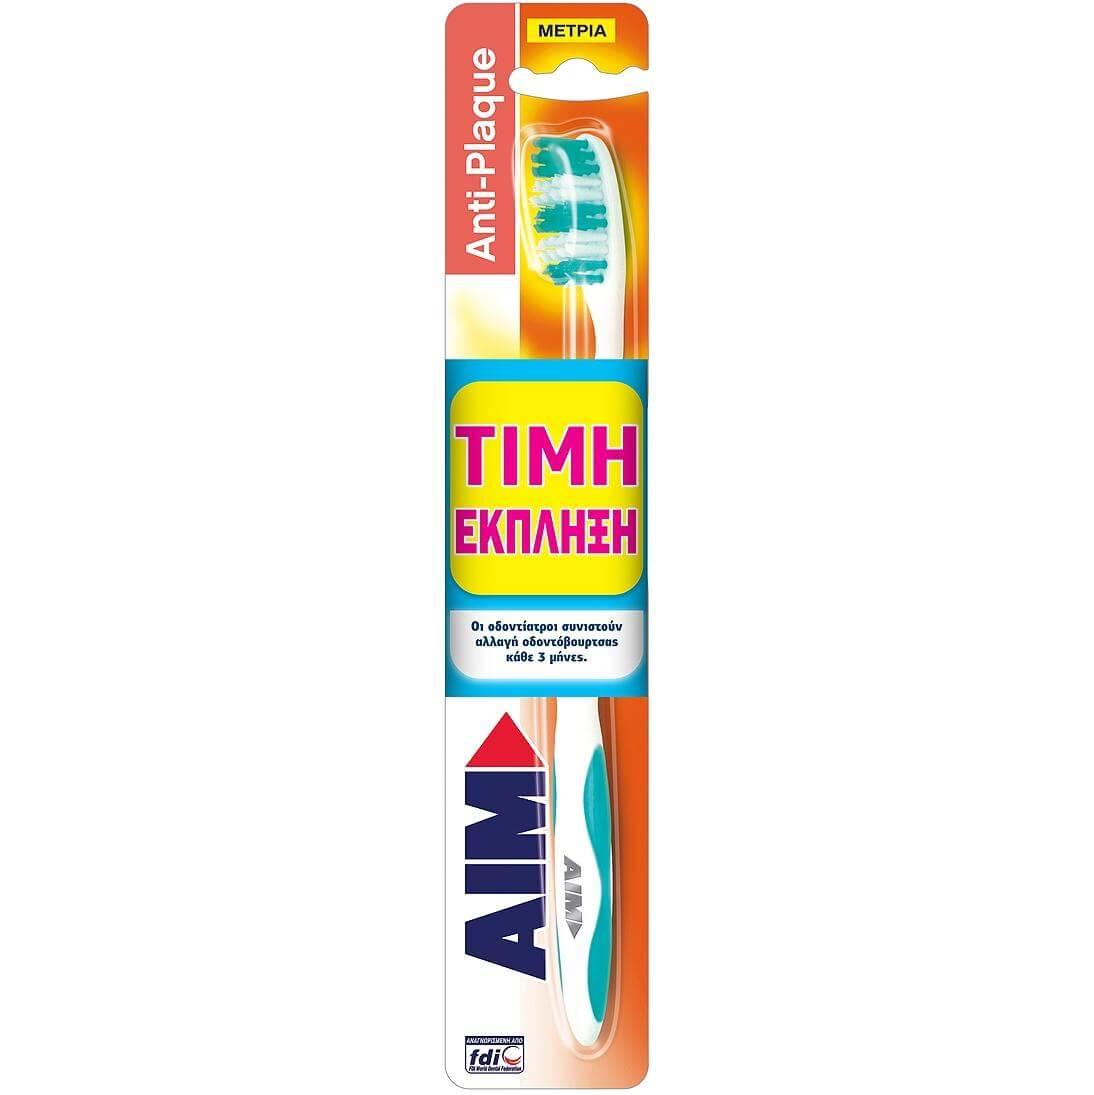 Aim Οδοντόβουρτσα Antiplaque Μέτρια